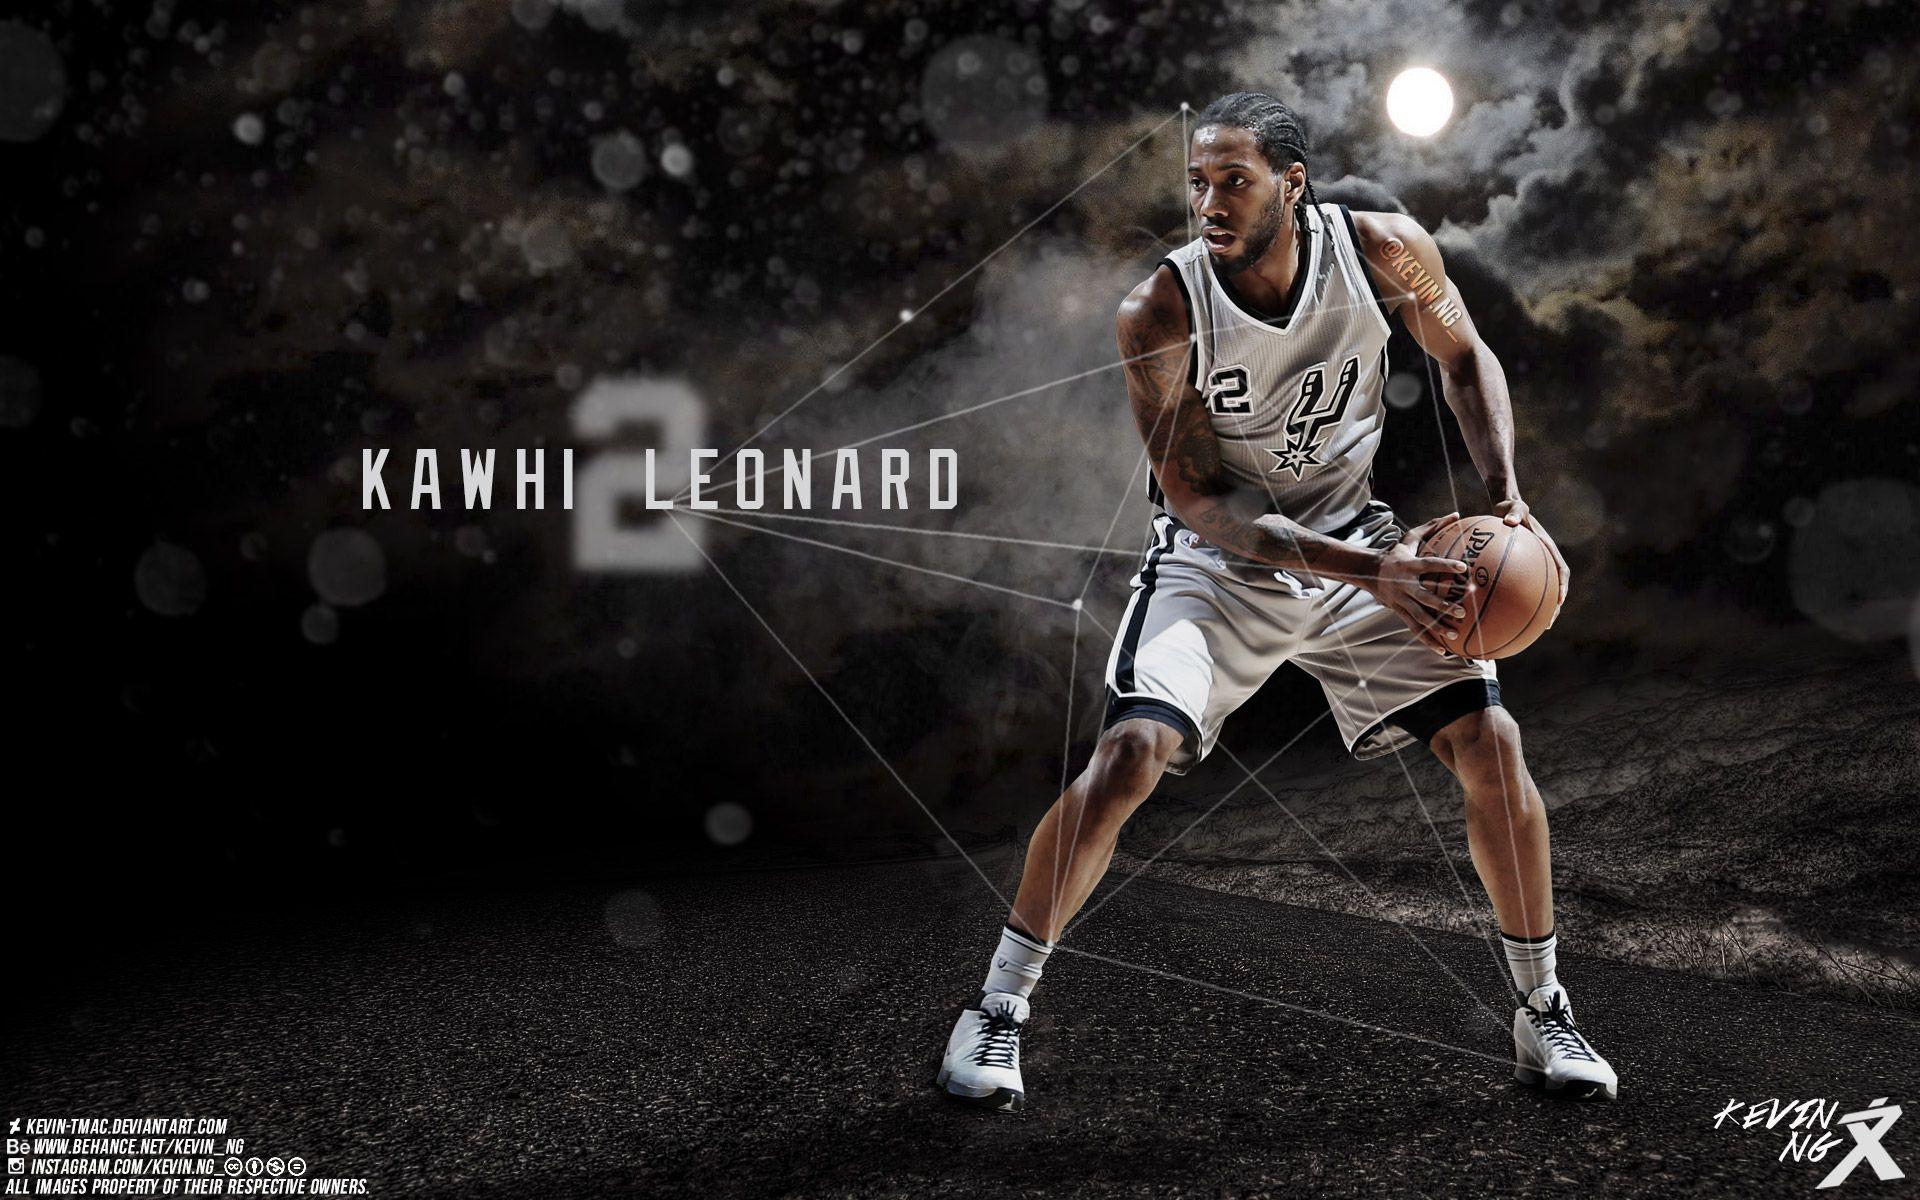 Kawhi Leonard San Antonio Spurs 2016 Wallpaper (With